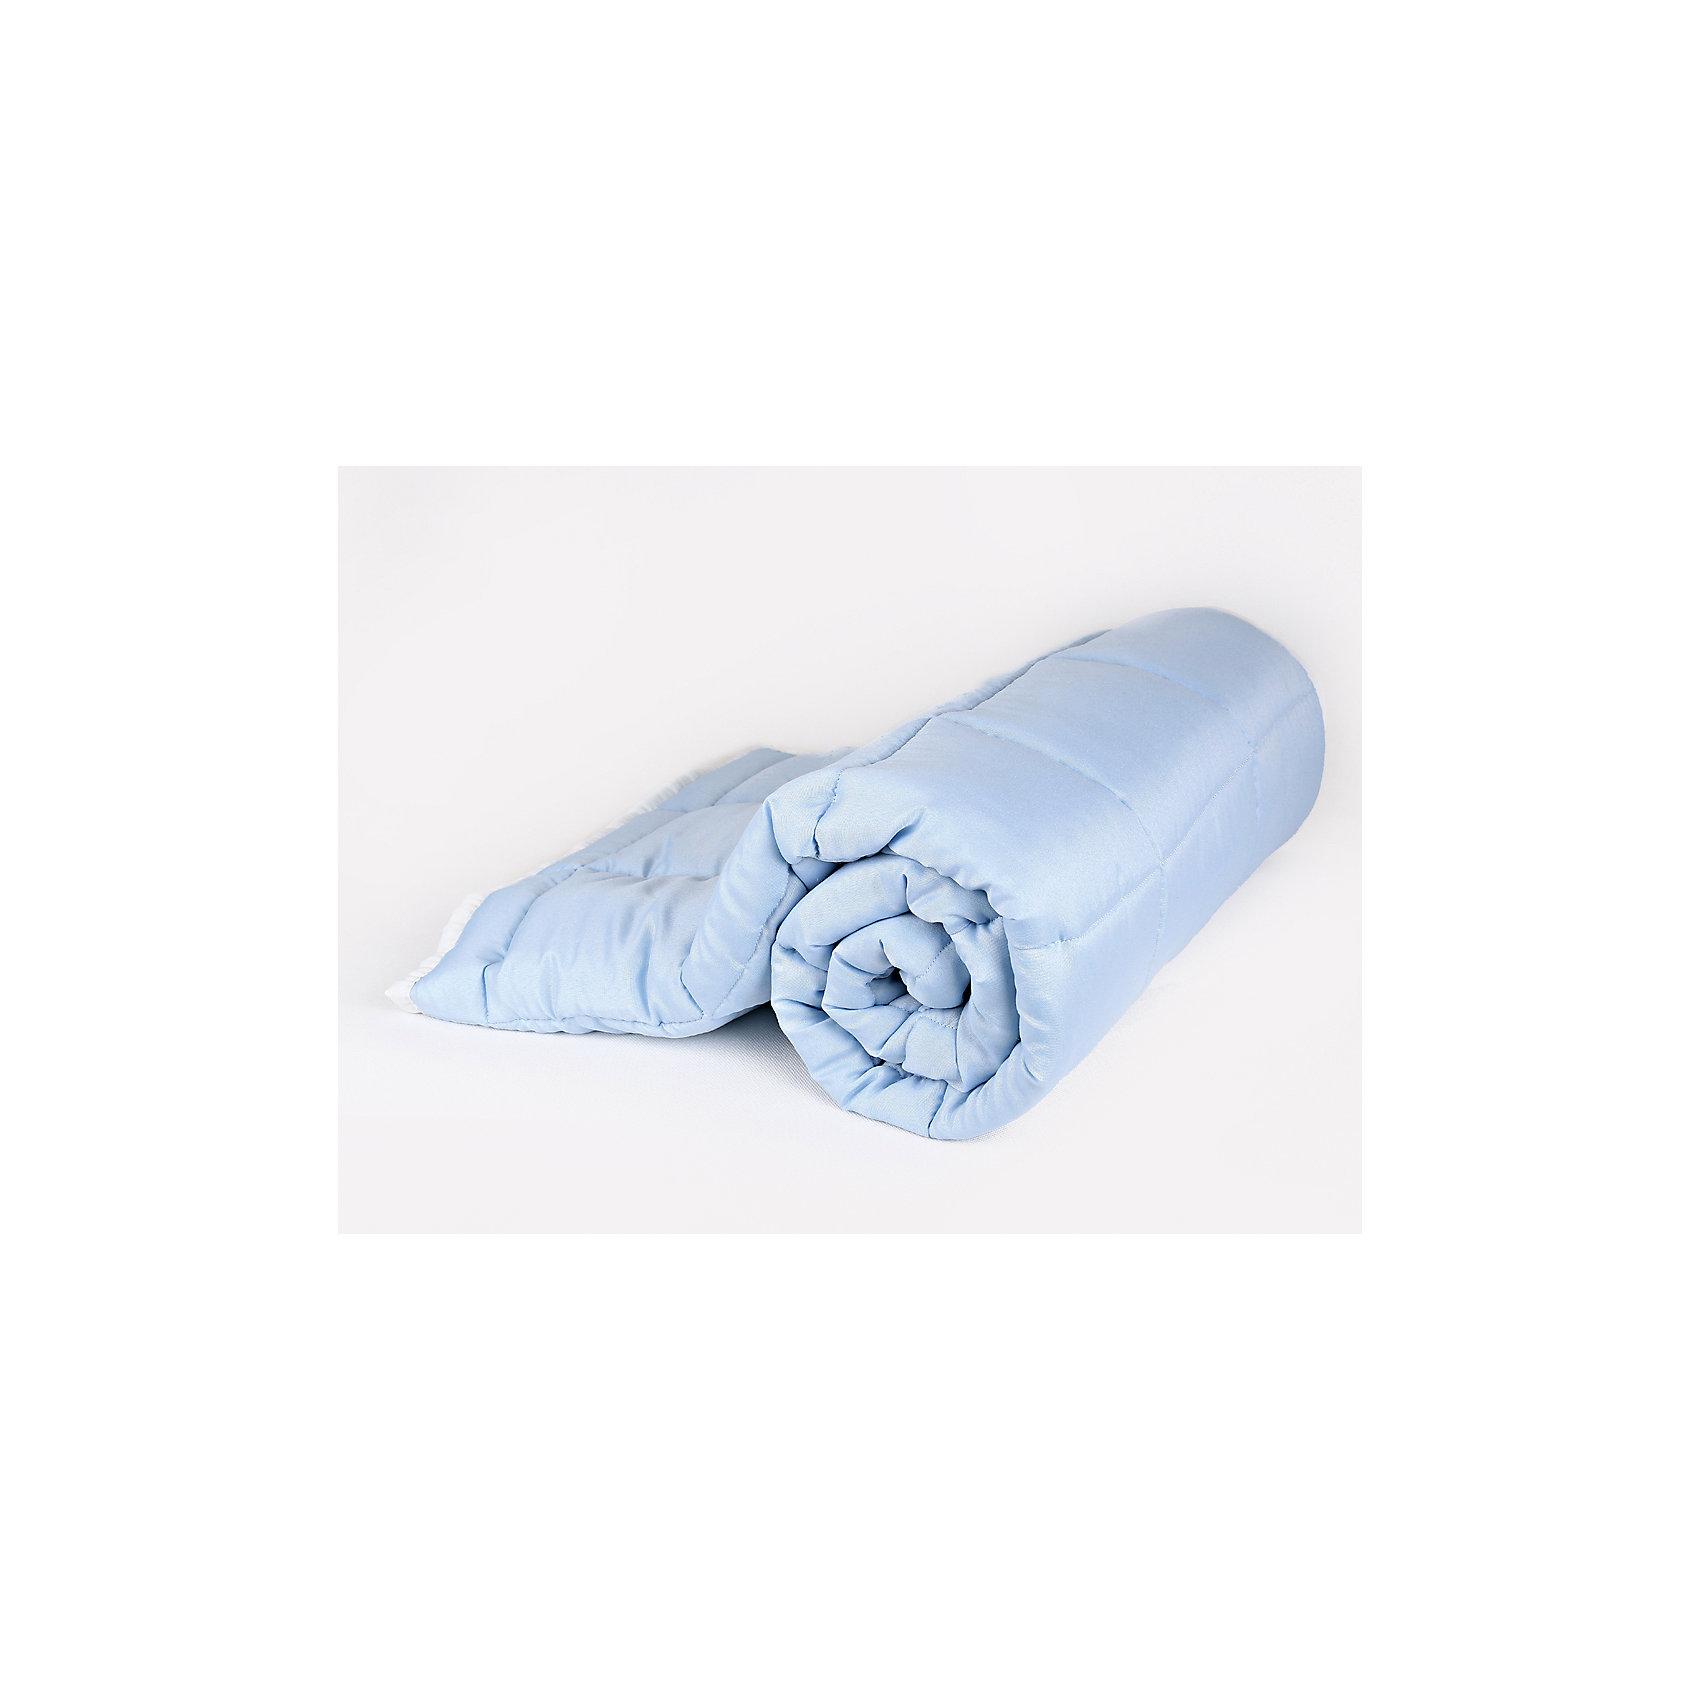 Baby Nice Одеяло стеганное, 110х140 см, Baby Nice, голубой baby nice бортик гнездышко 85х45см baby nice голубой